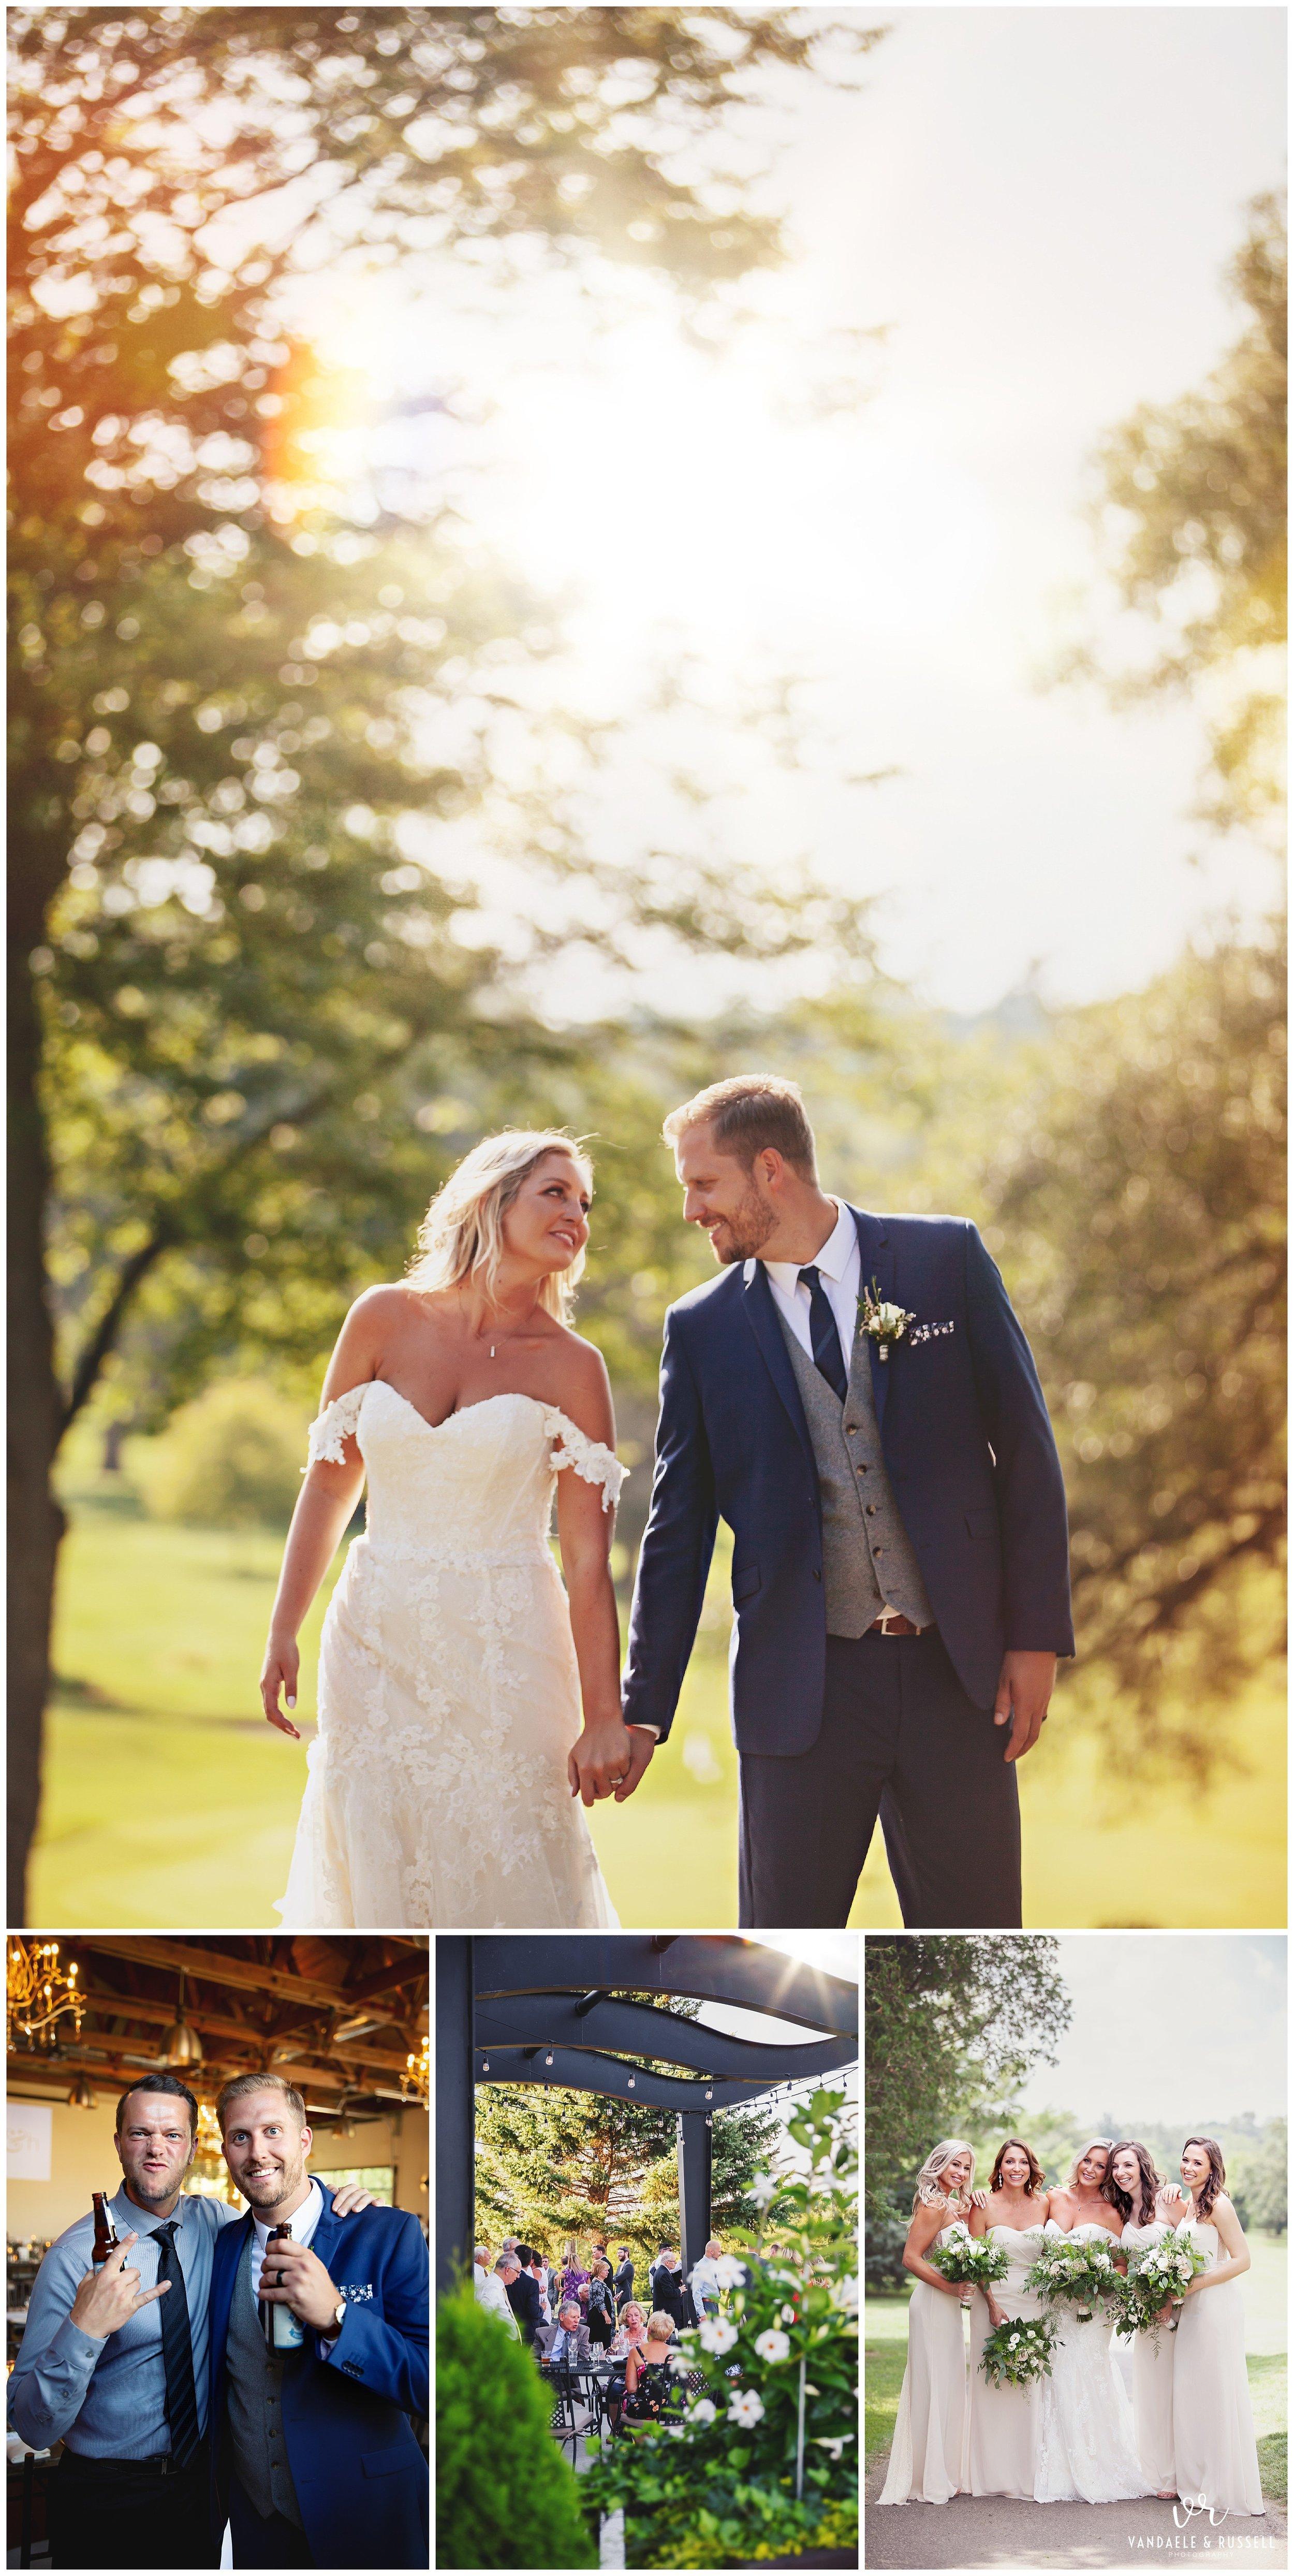 VanDaele-Russell-Wedding-Photography-London-Toronto-Ontario_0176.jpg